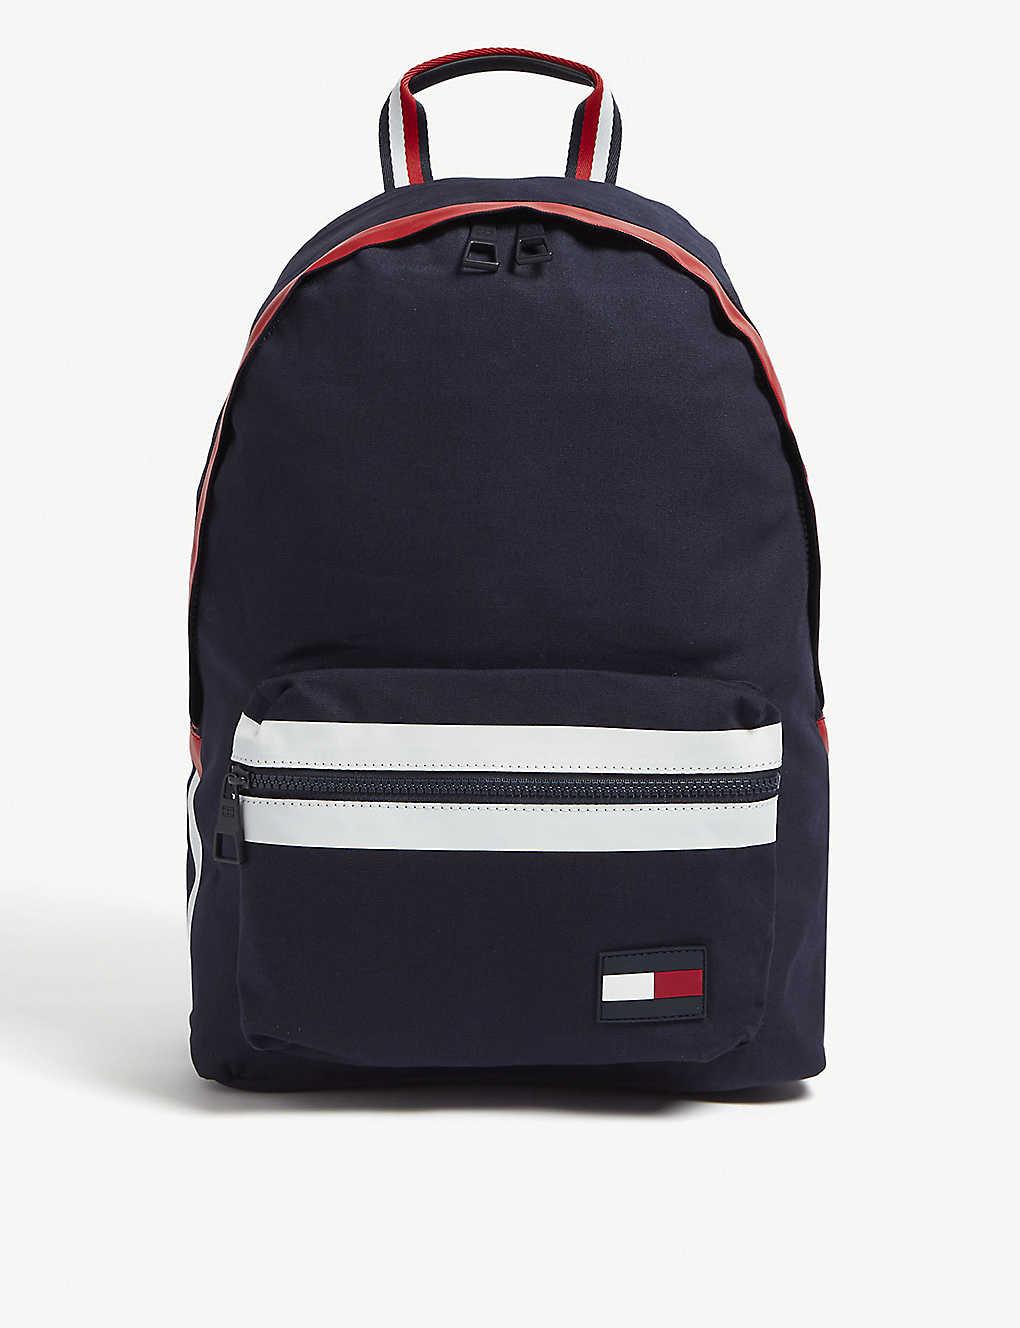 d64bbe3292d TOMMY HILFIGER - Pop laptop backpack | Selfridges.com